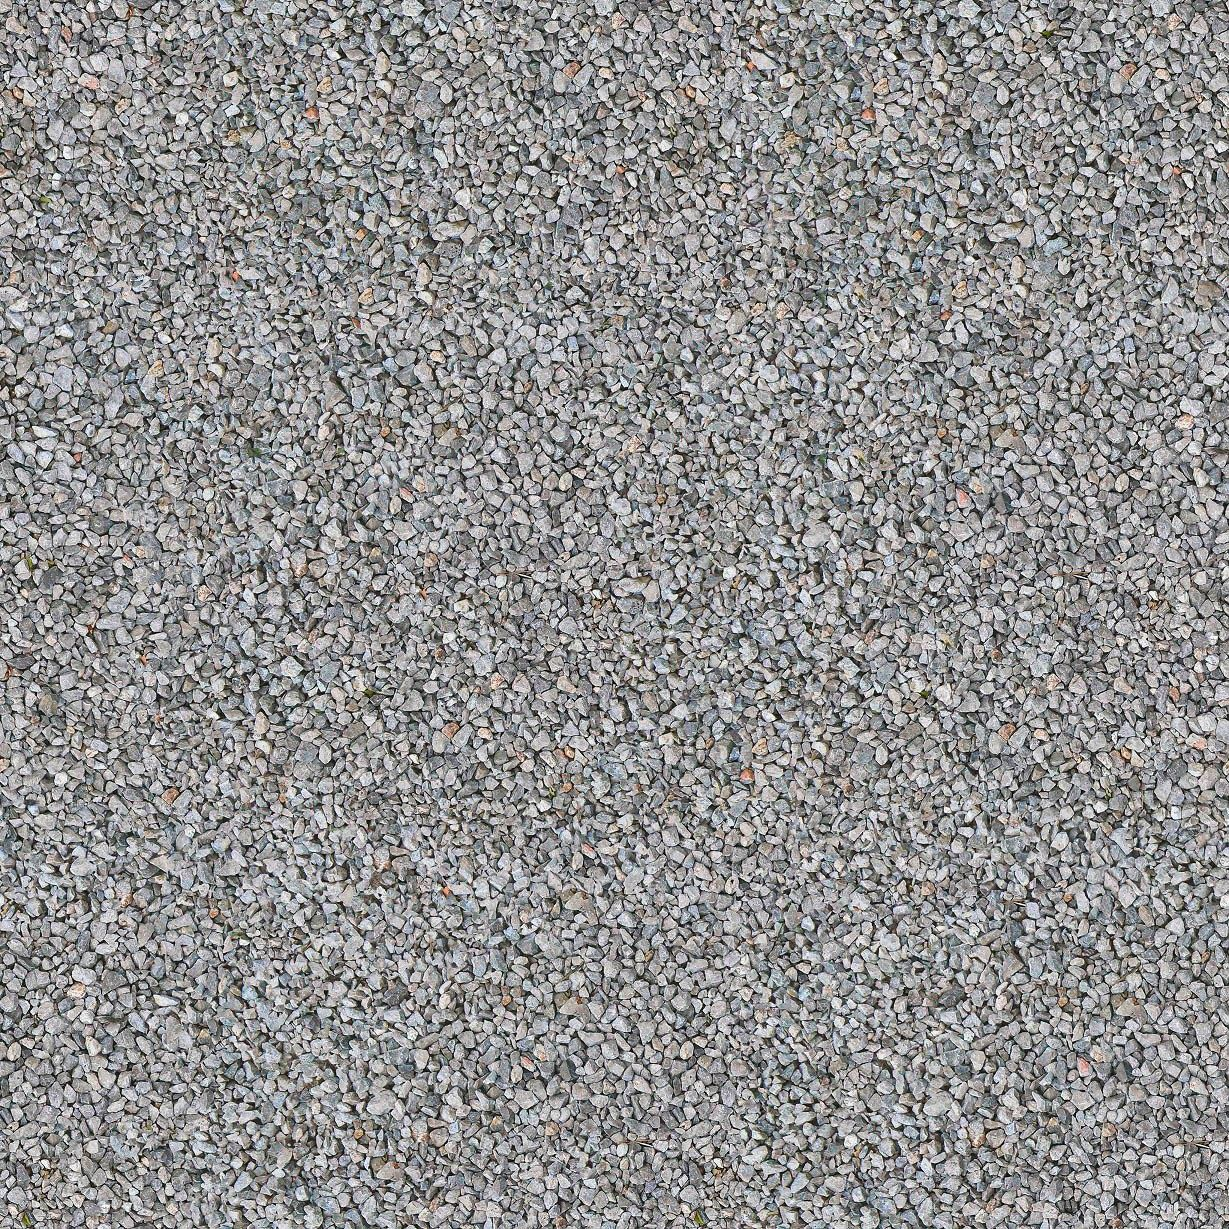 Pin By Jaime Aguilar On Stucco Texture: Texture Seamless Shingle